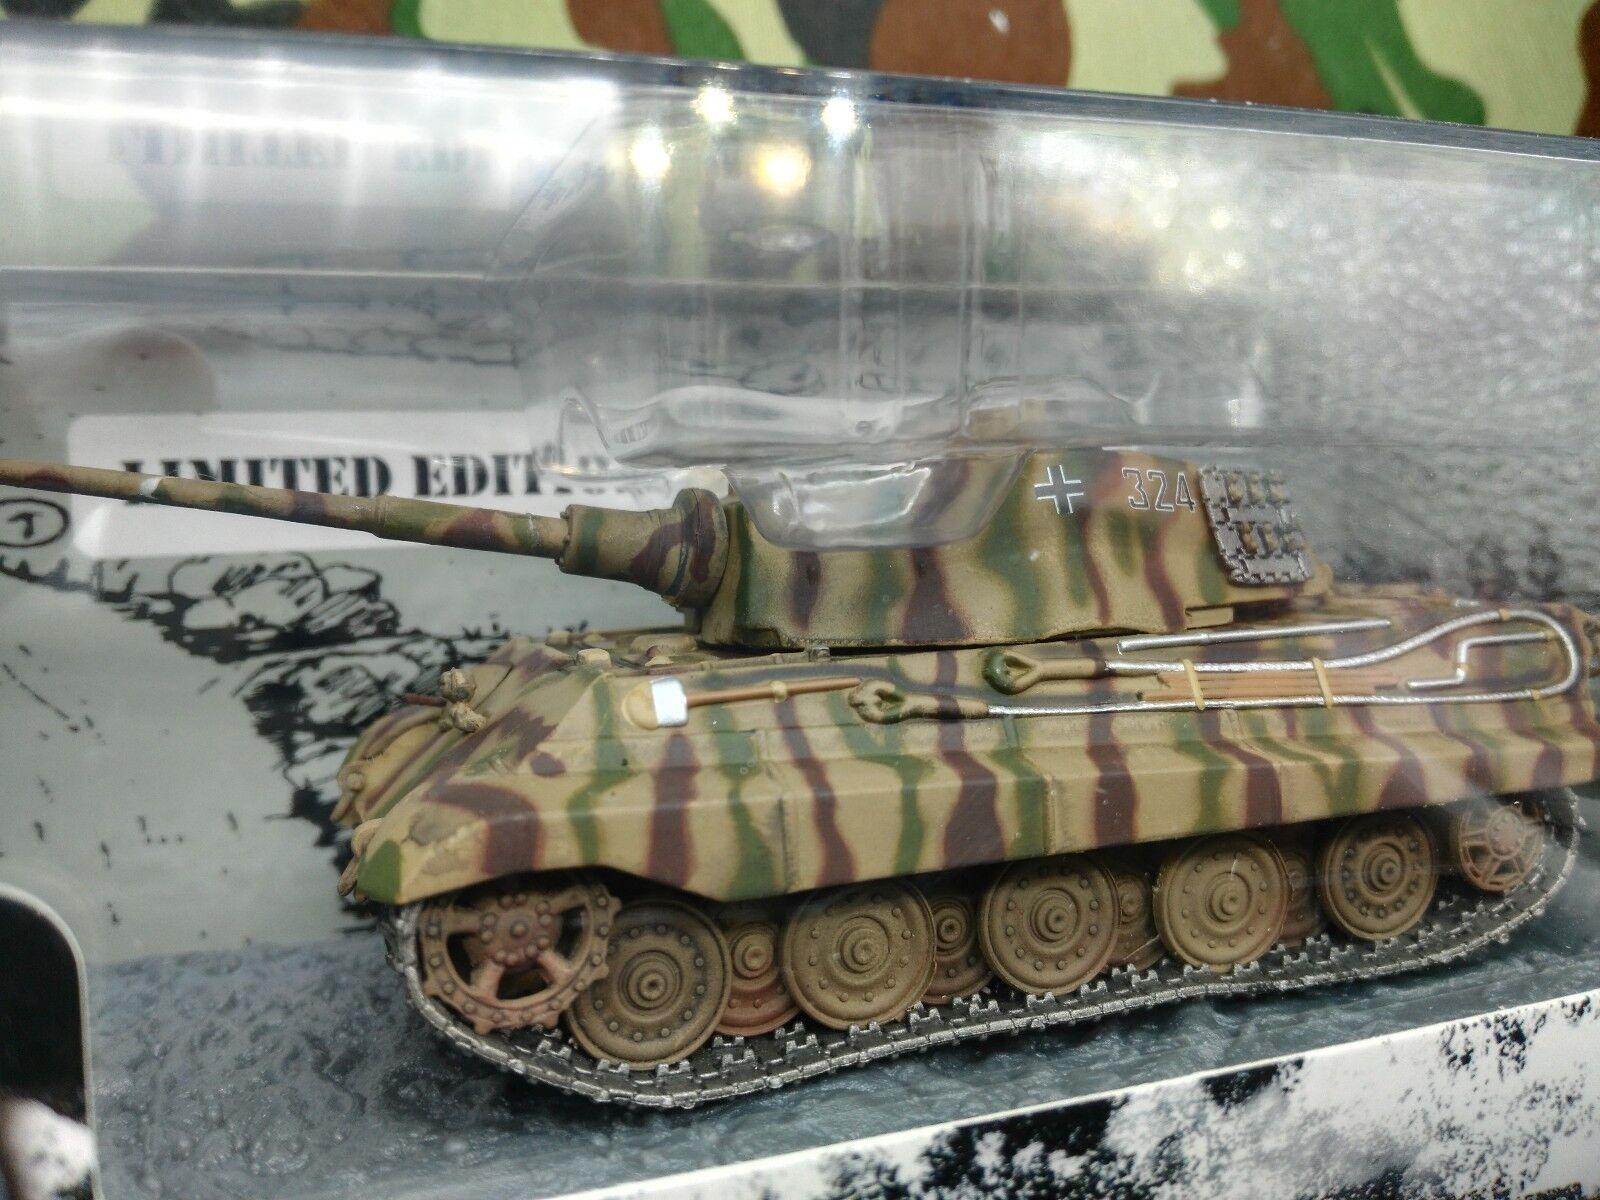 Warmaster  Dragon Armor 1 72 King Tiger II Tank voiturero Armato TANQUE  2018 magasin